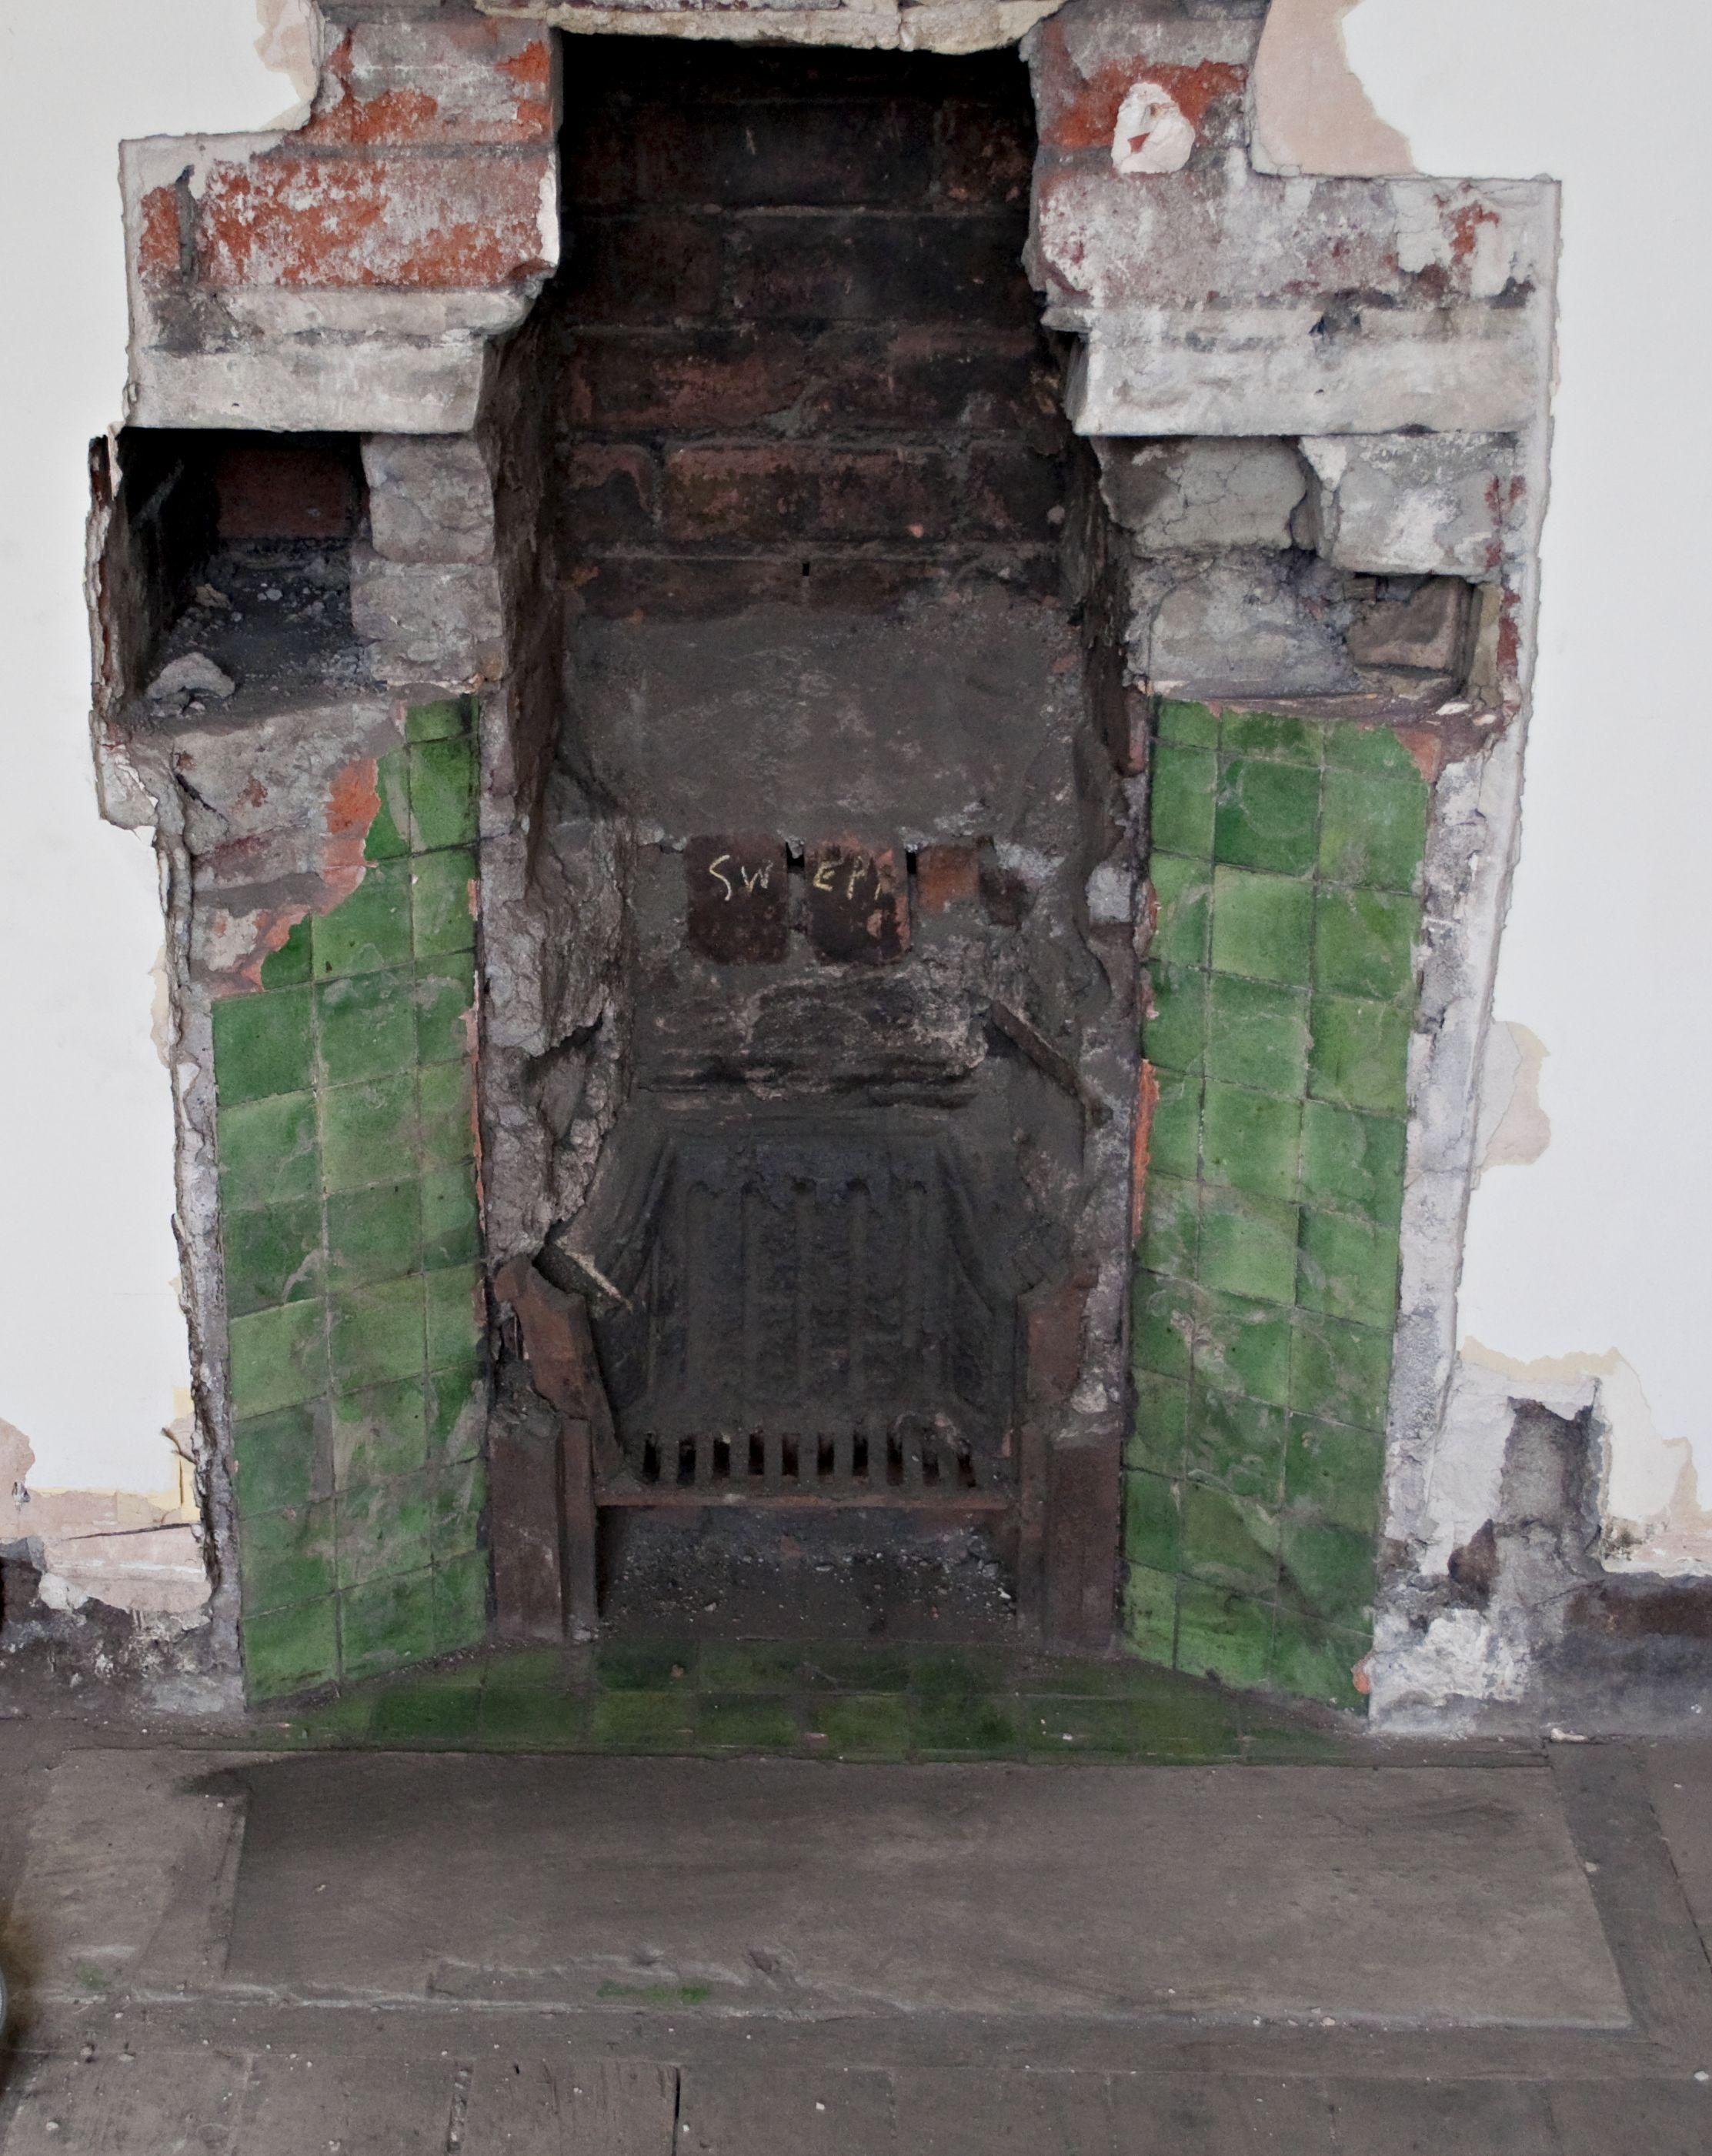 The pea green tiles